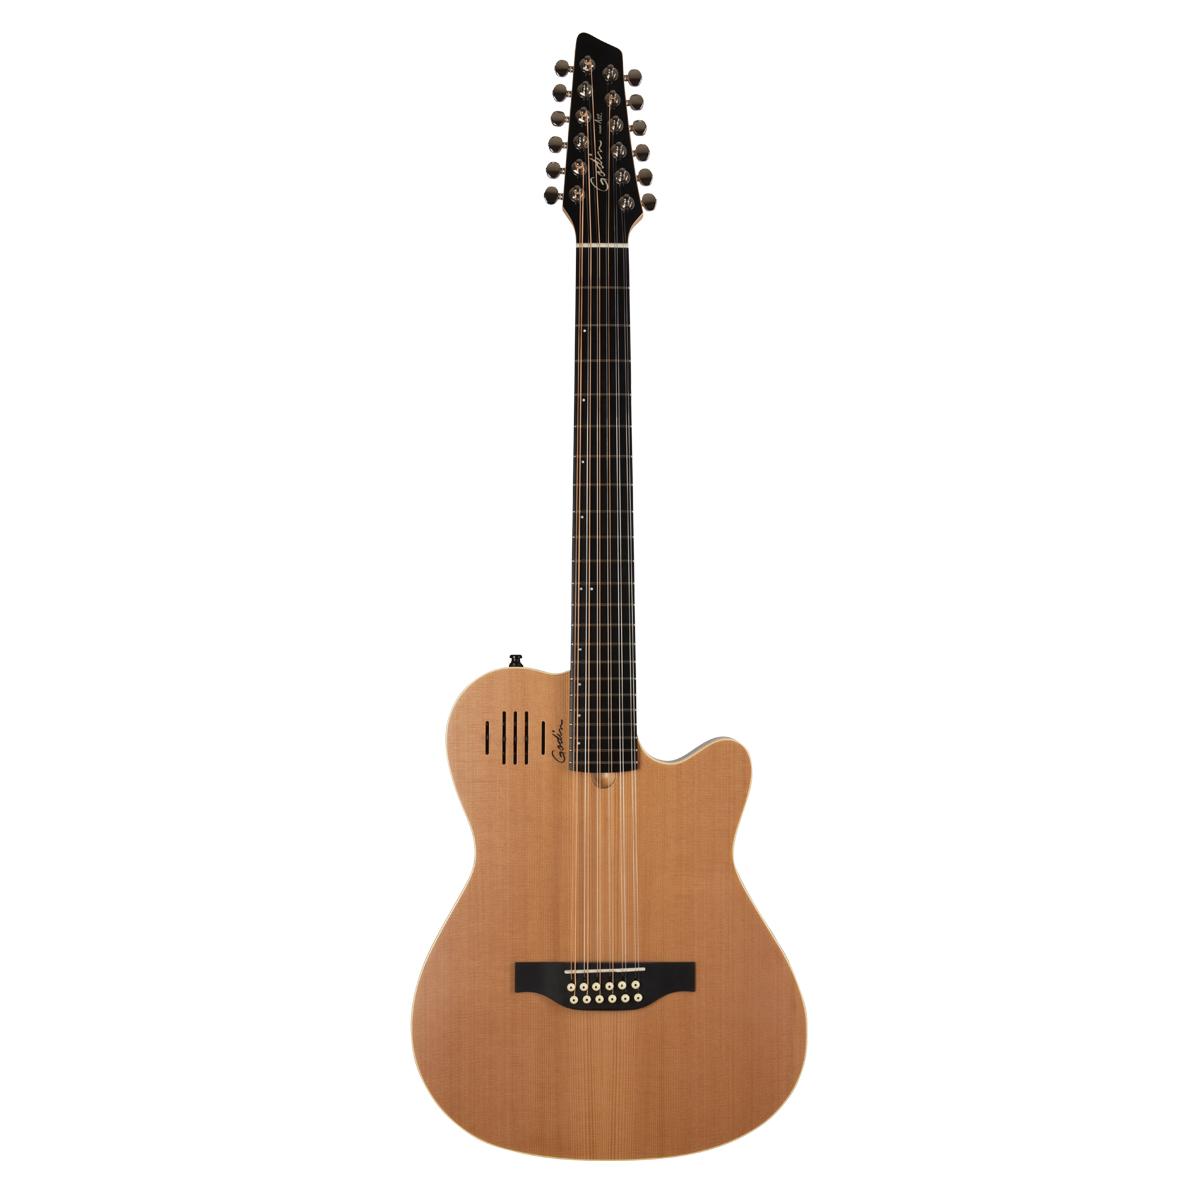 Godin 25343 A12 Acoustic Electric Guitar